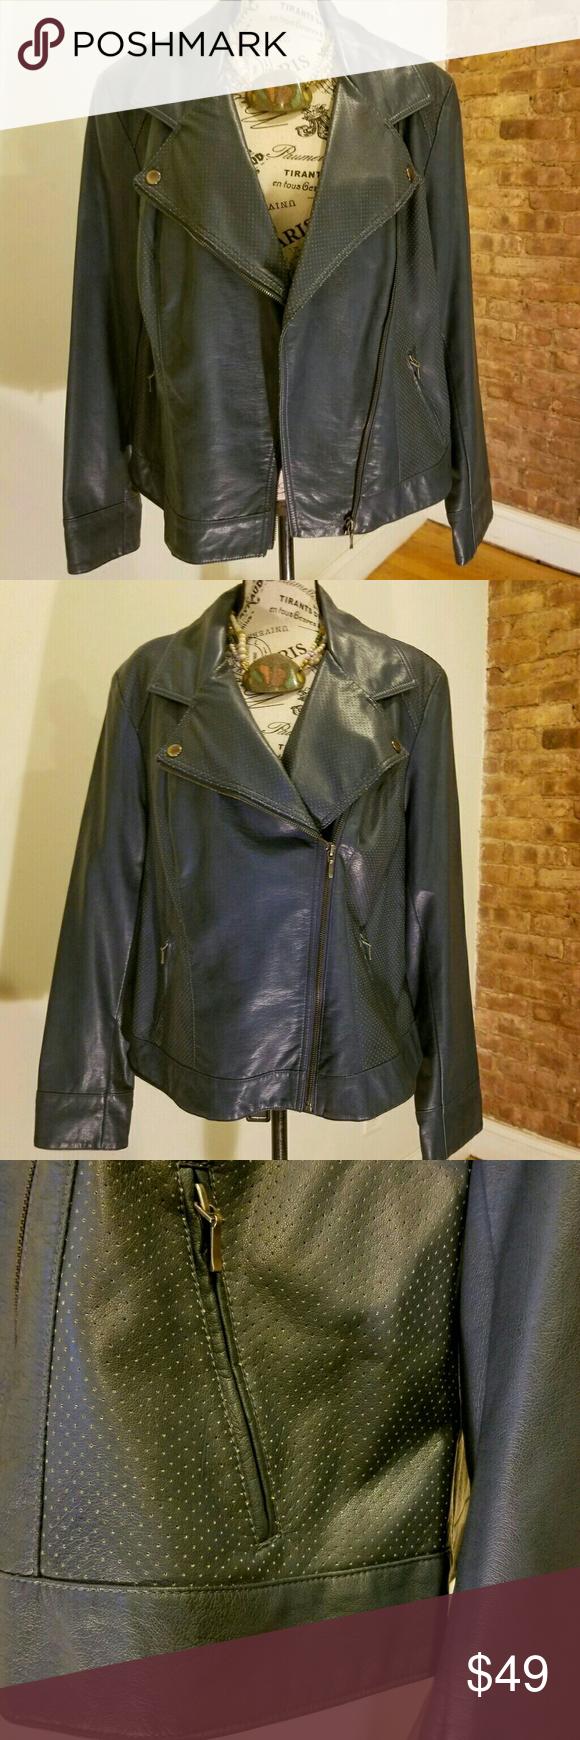 Inc International Concepts Faux Leather Jacket Faux Leather Jackets Leather Jacket Clothes Design [ 1740 x 580 Pixel ]